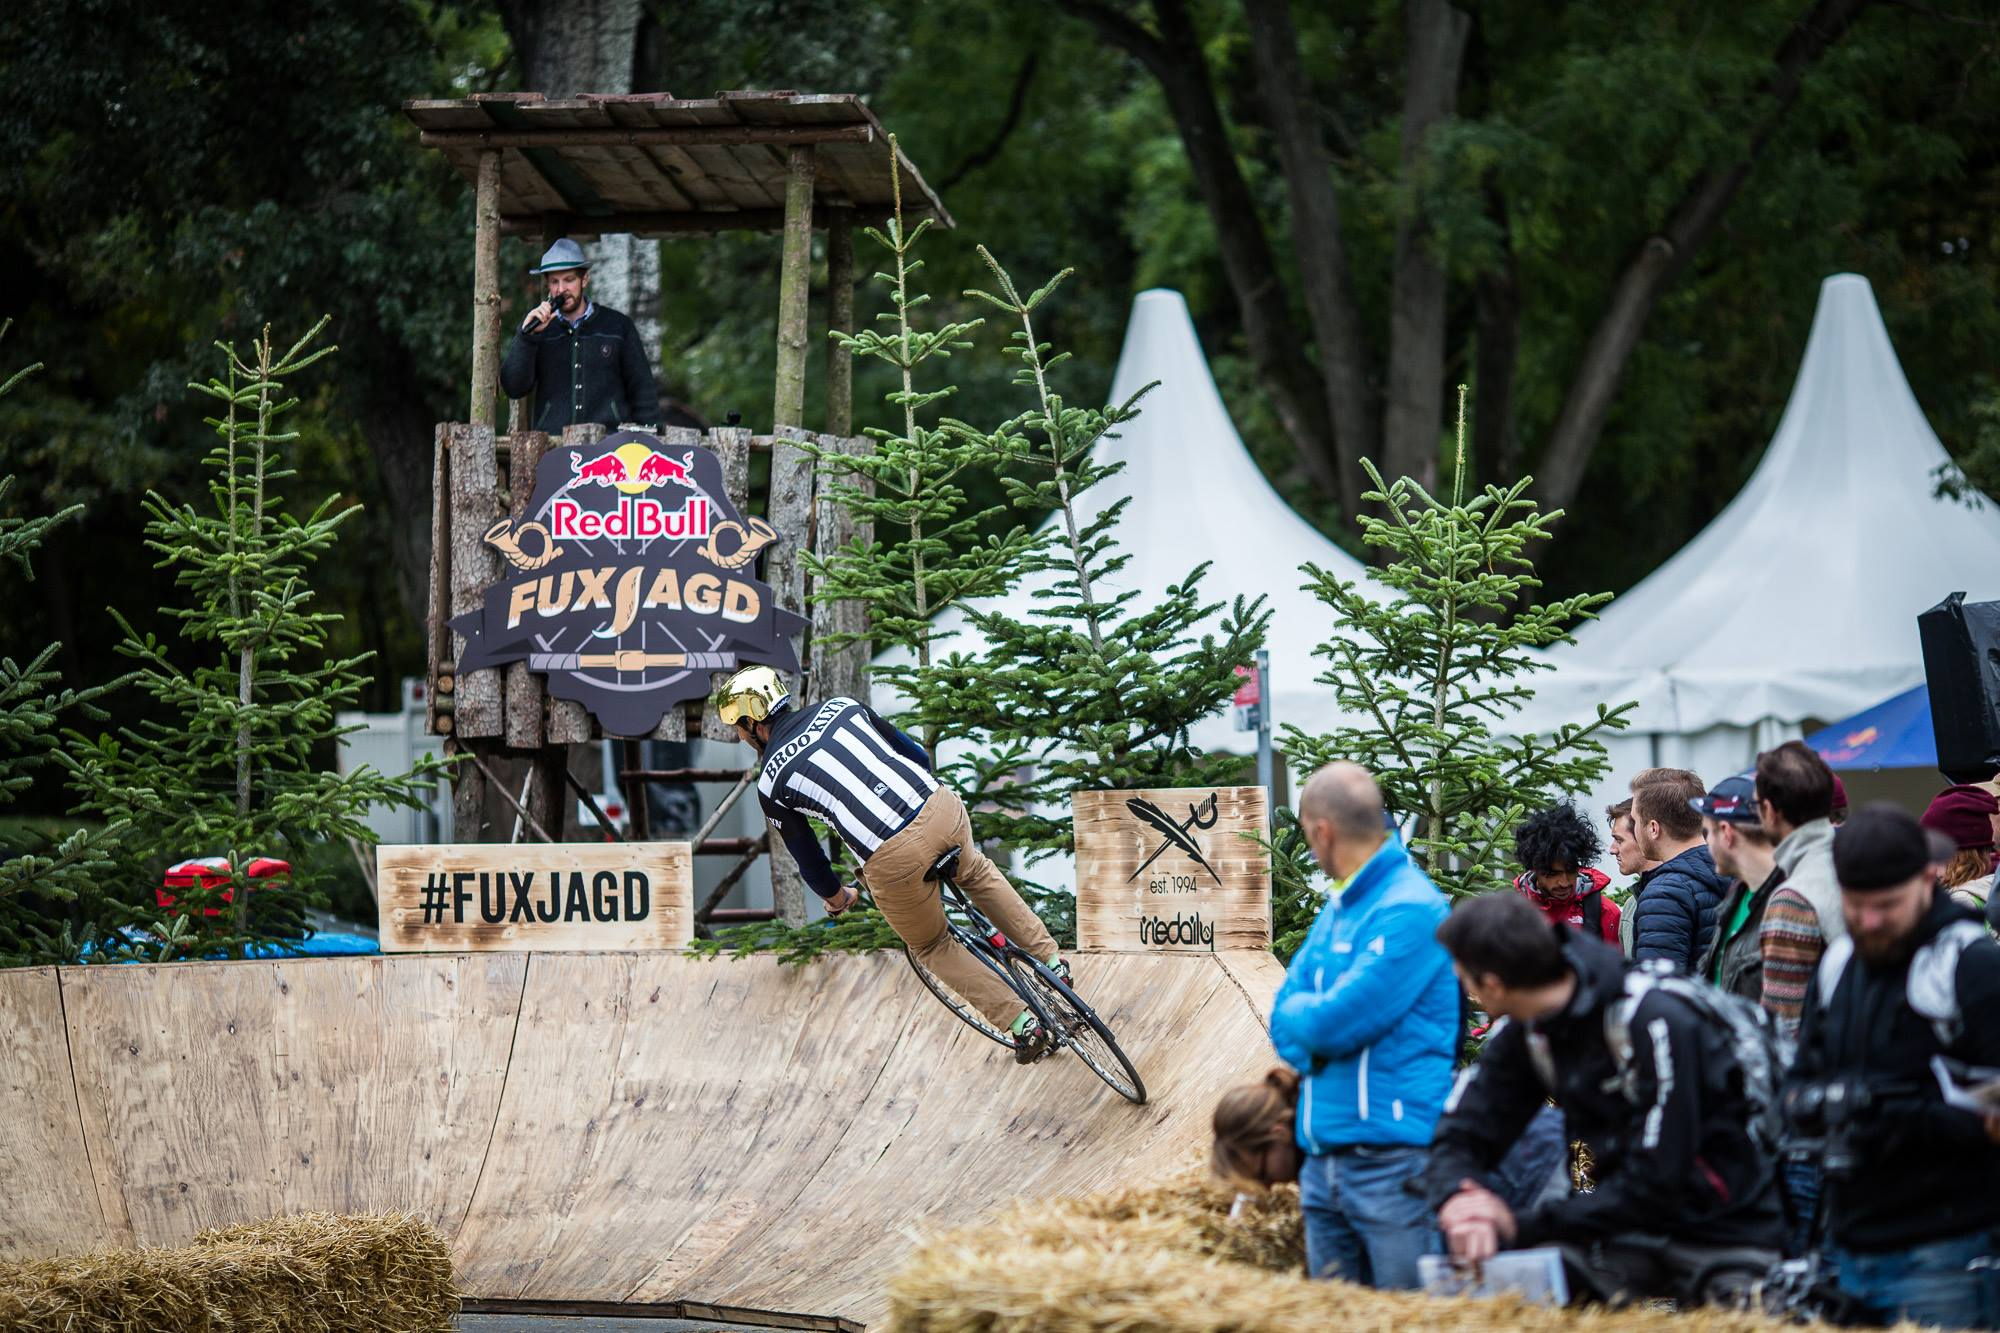 26.09.2015 Red Bull Fuxjagd im Wiener Prater